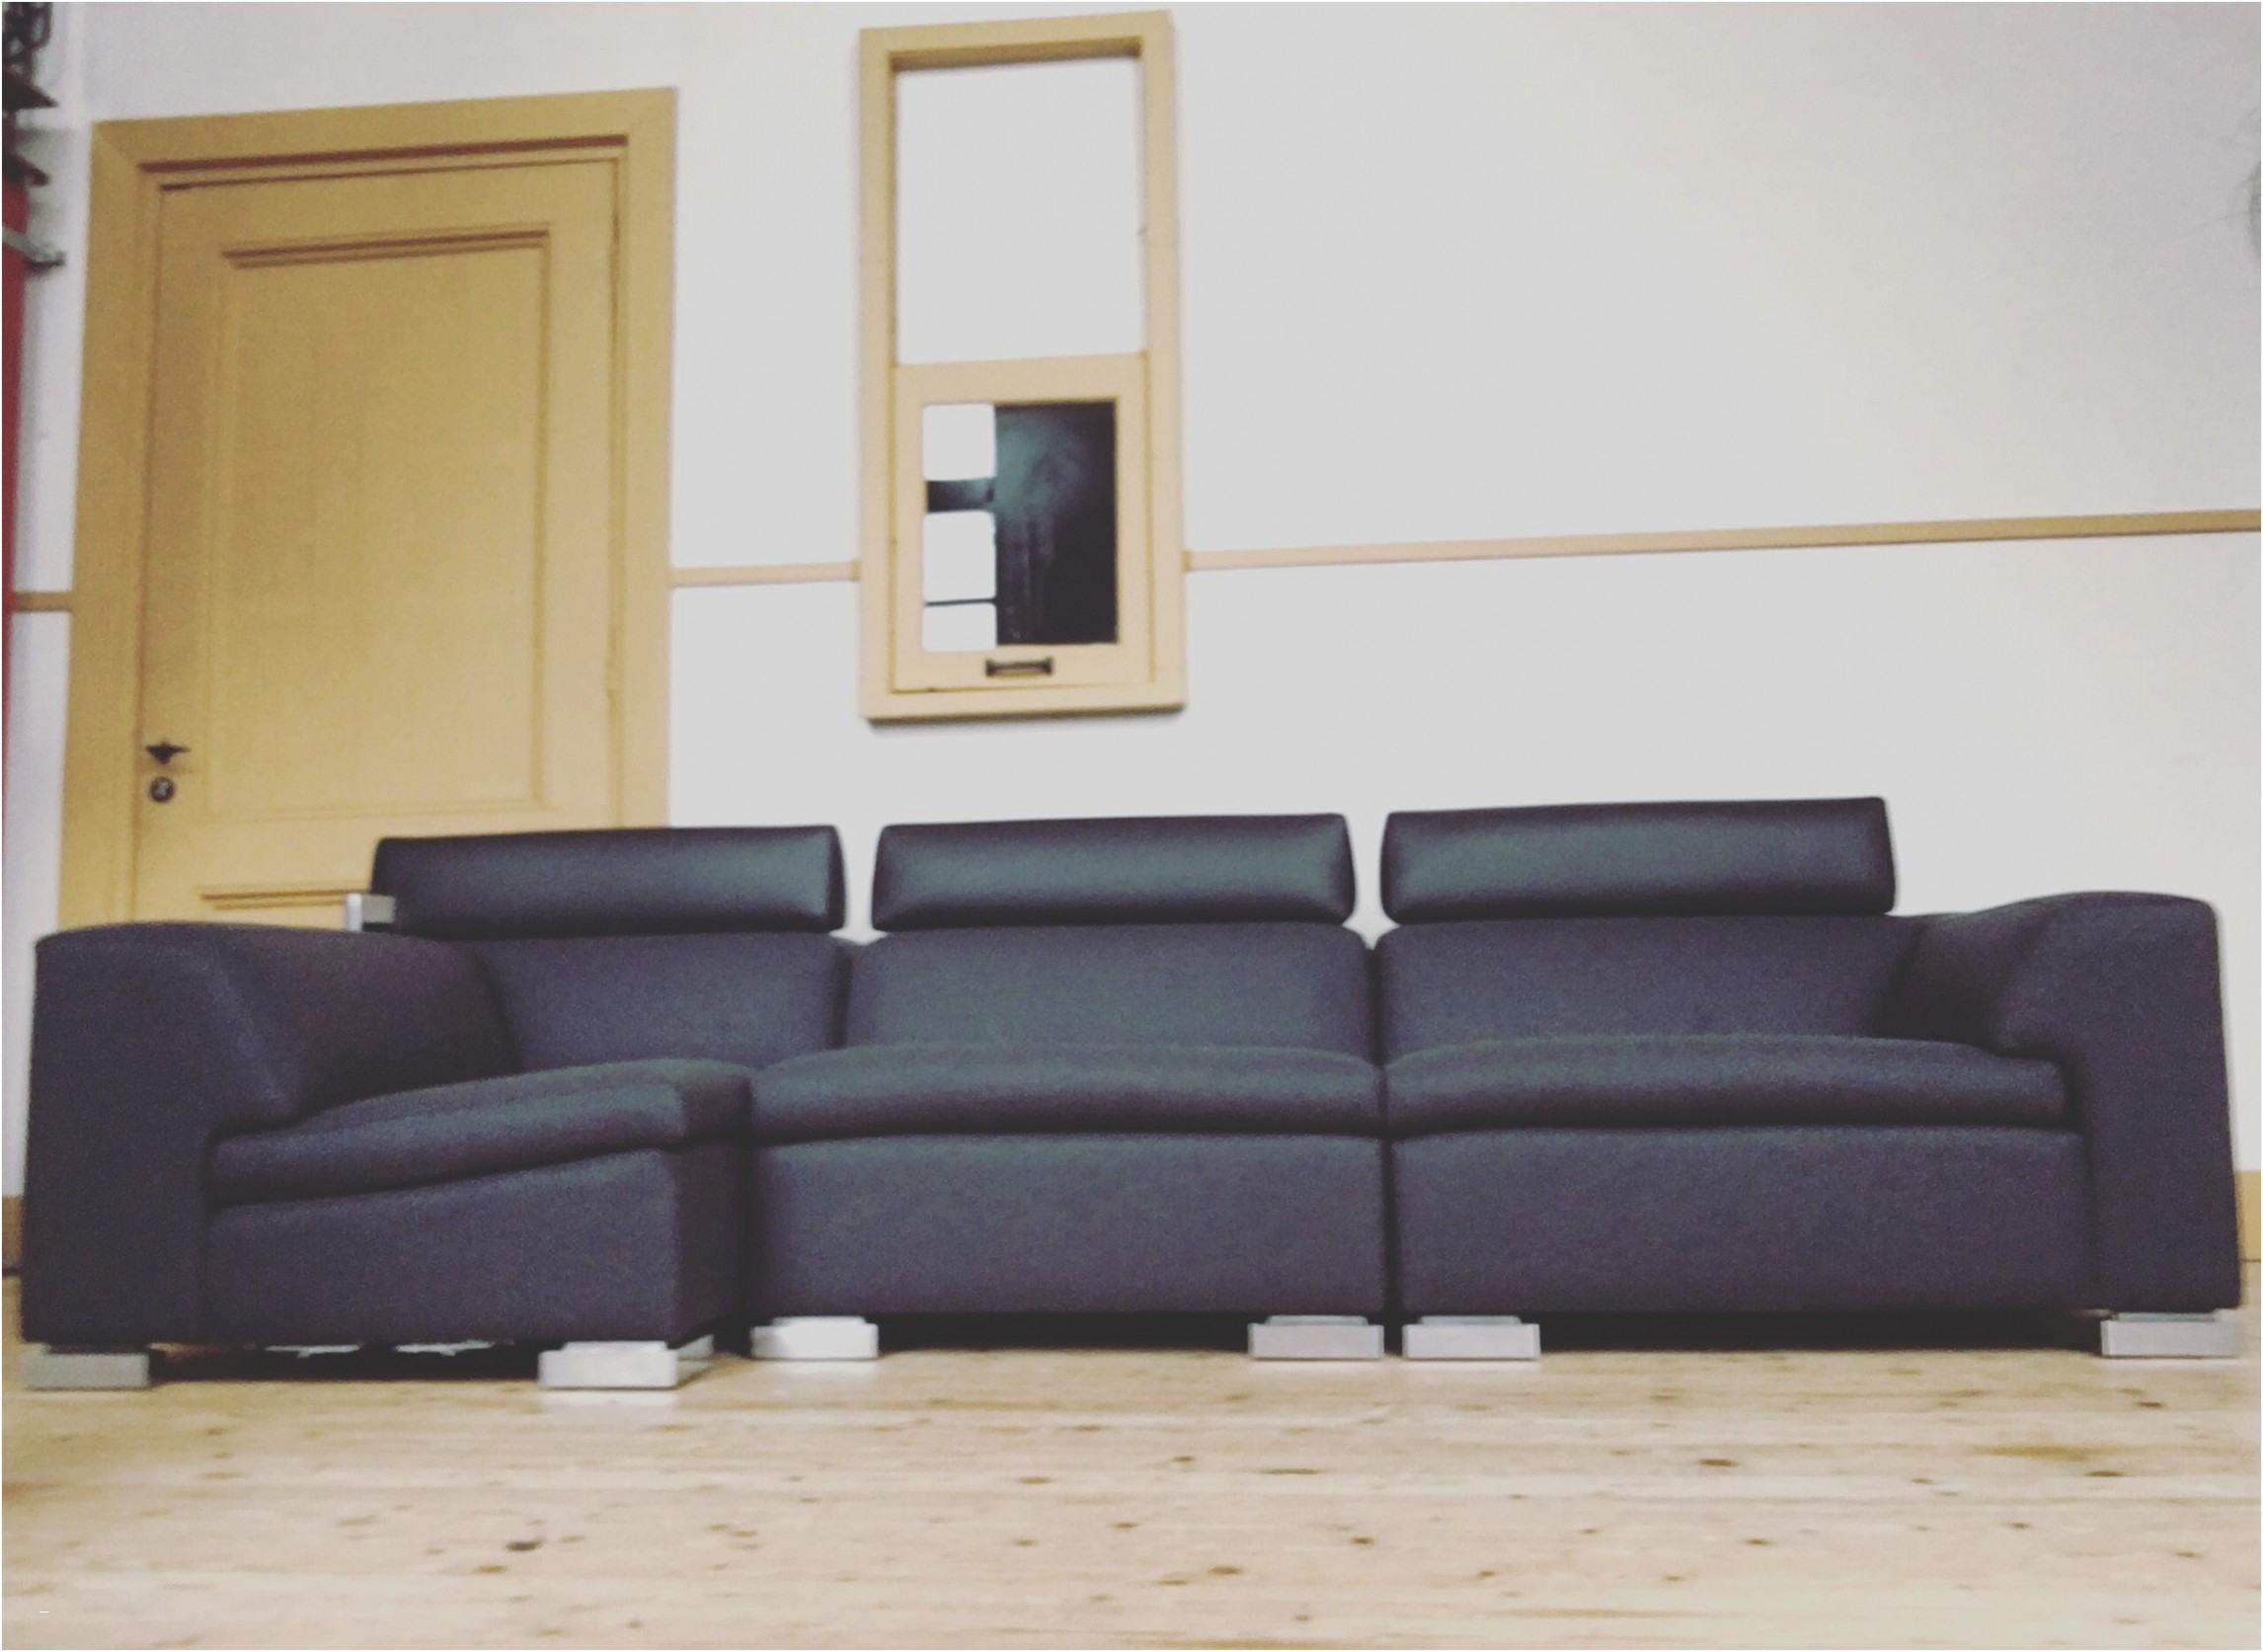 Kohls Chair Cushions Kohl S Patio Chairs Marvellous sofa Upholstery 0d Patio